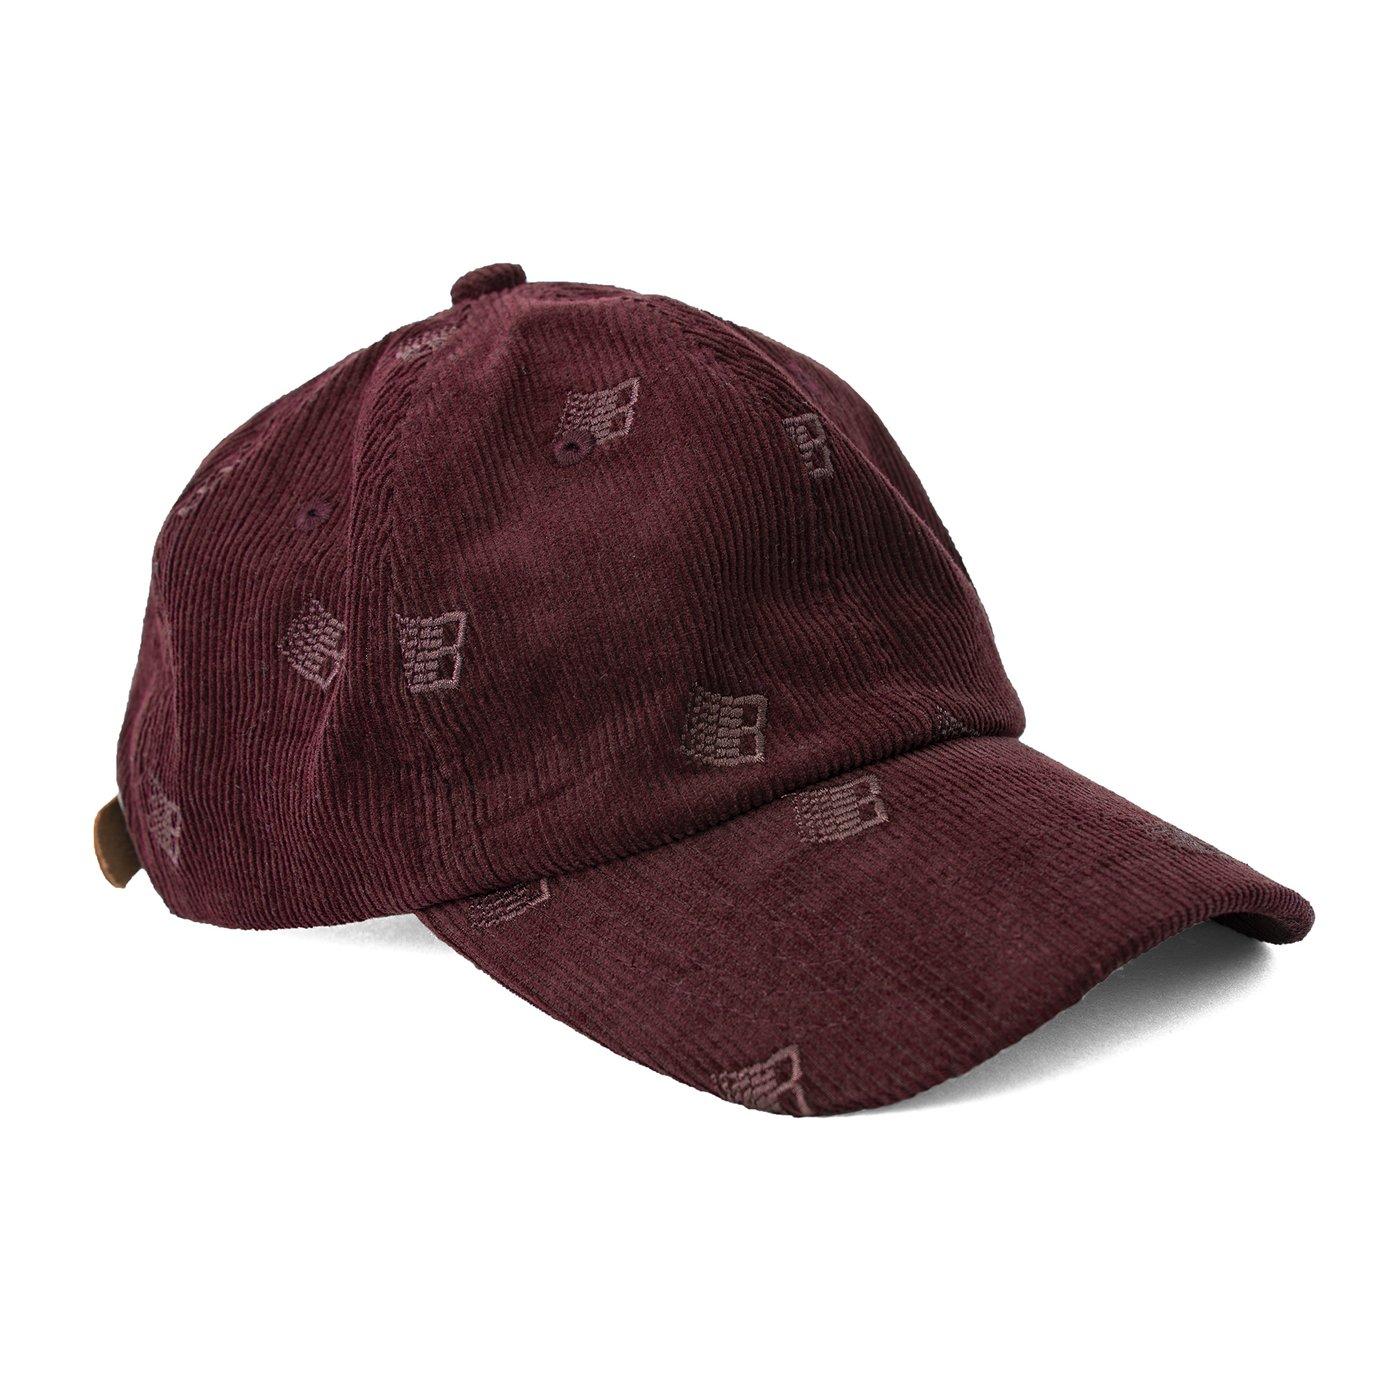 Hat Corduroy Maroon 1 Low 1400x